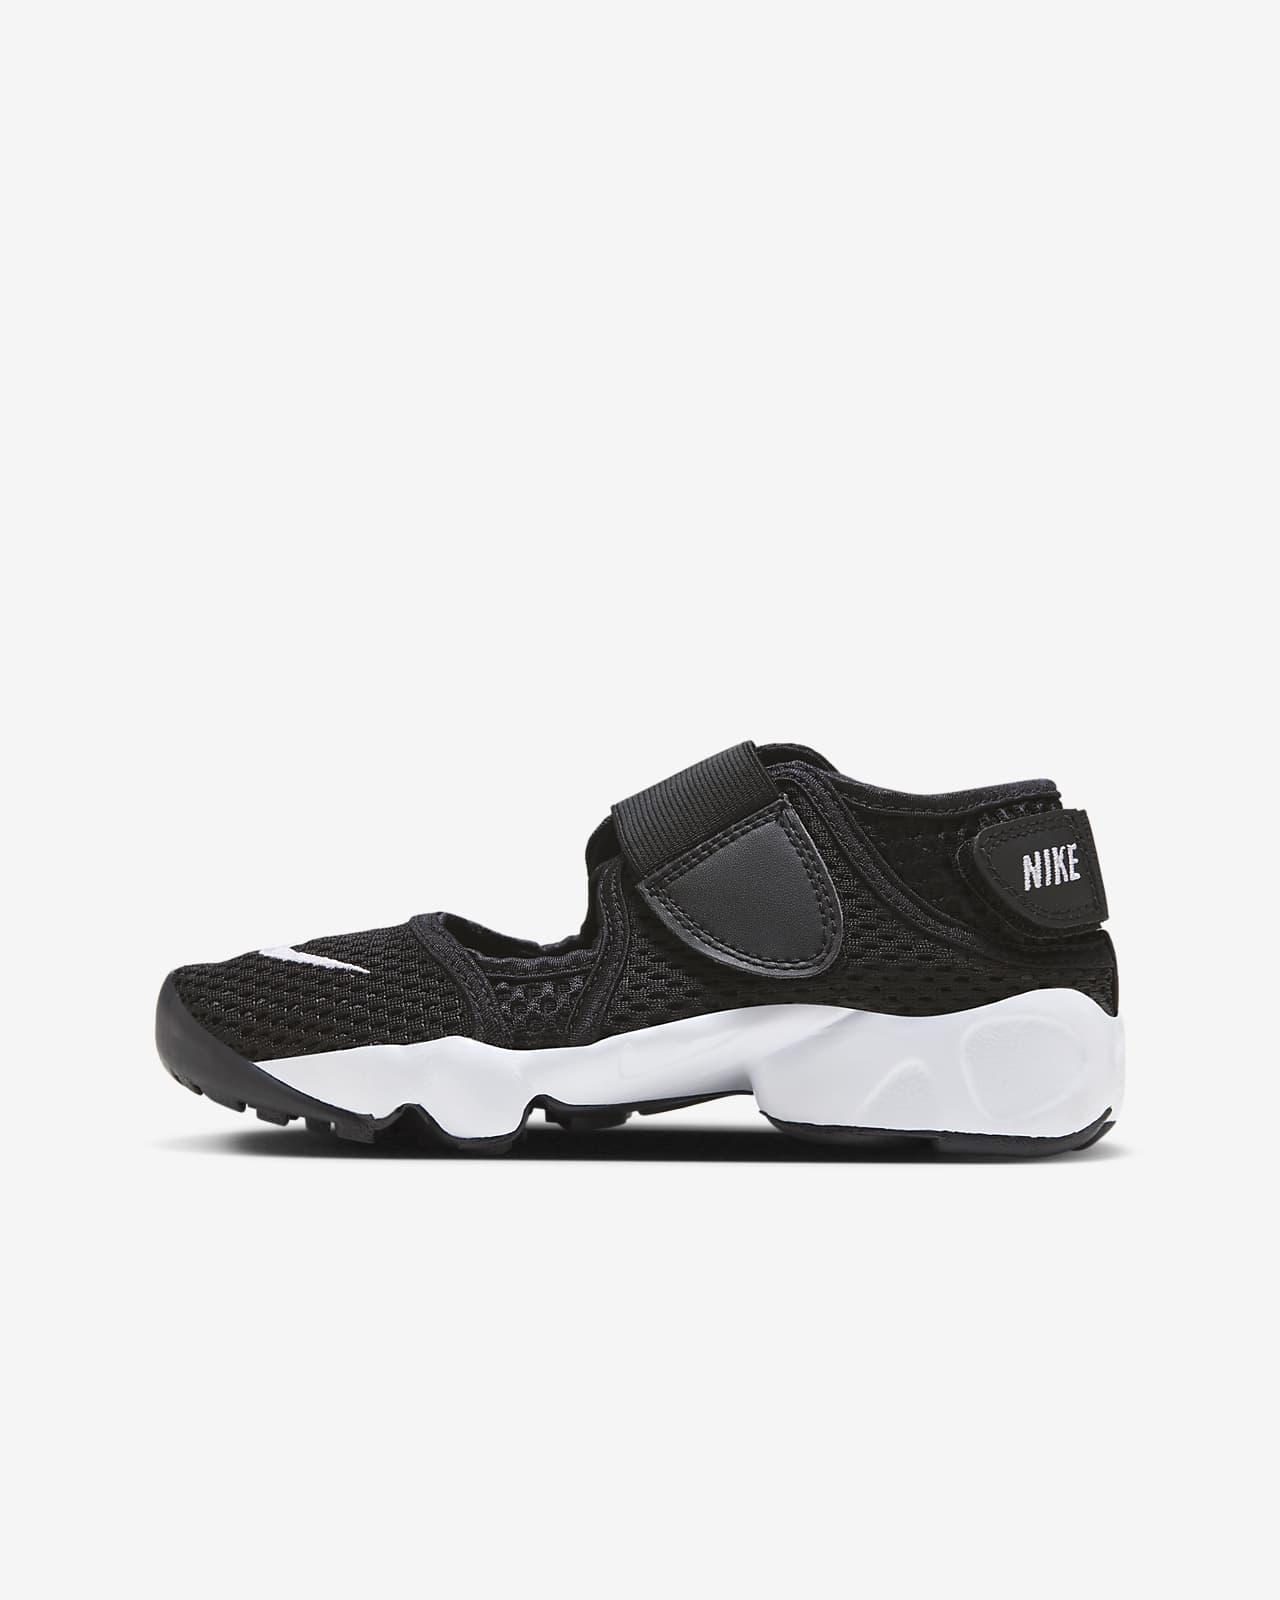 Nike Rift Little/Big Kids' Shoe